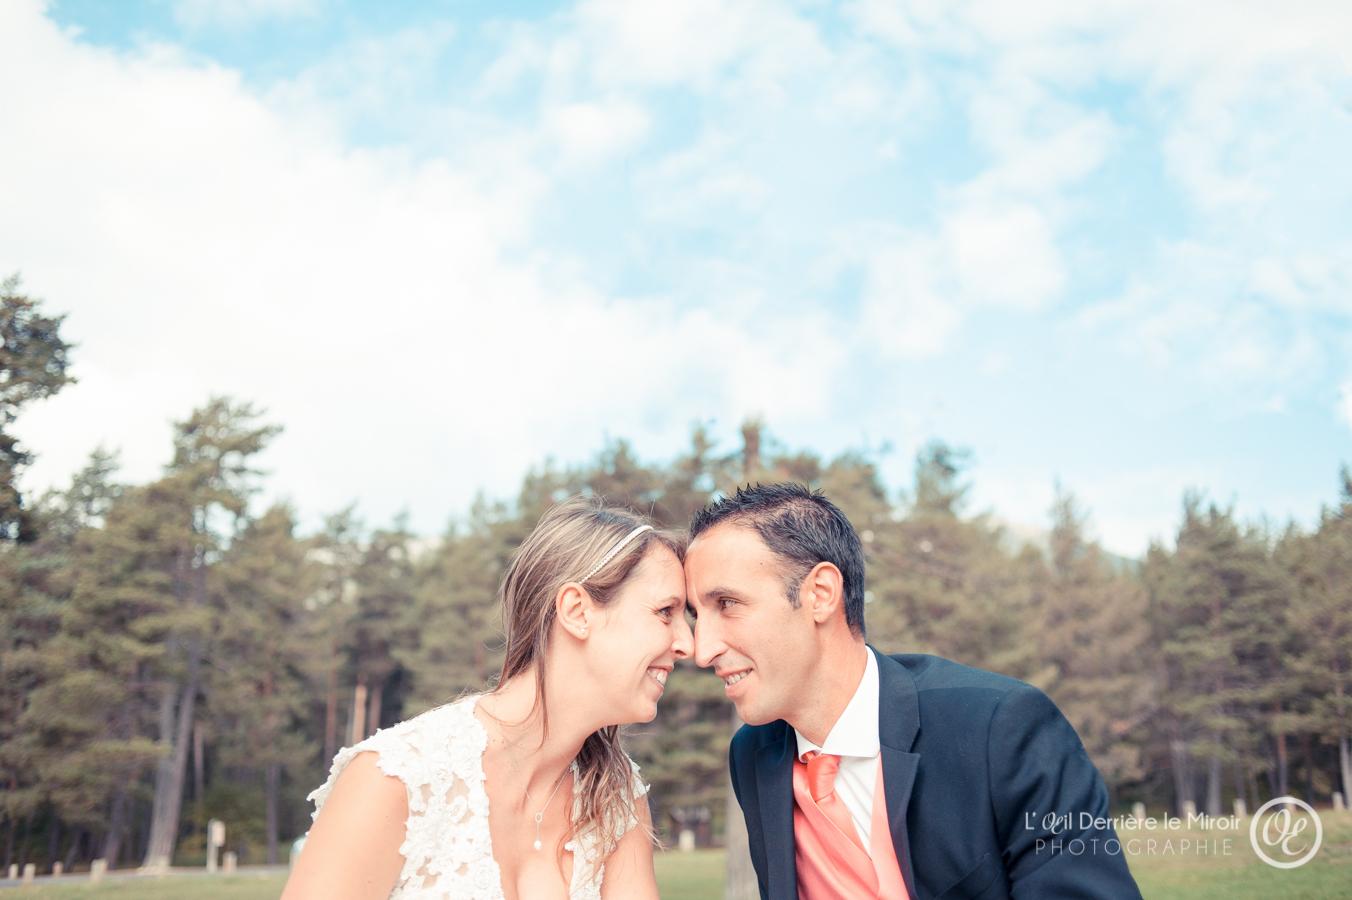 After-wedding-Audrey-Luis-loeilderrierelemiroir-40